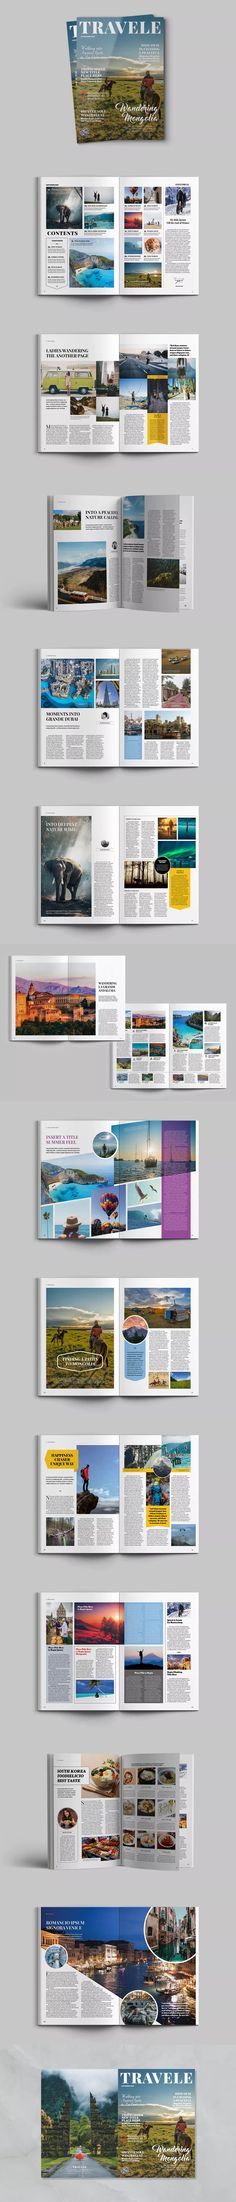 Traveling Magazine Template InDesign INDD - A4 #unlimiteddownloads